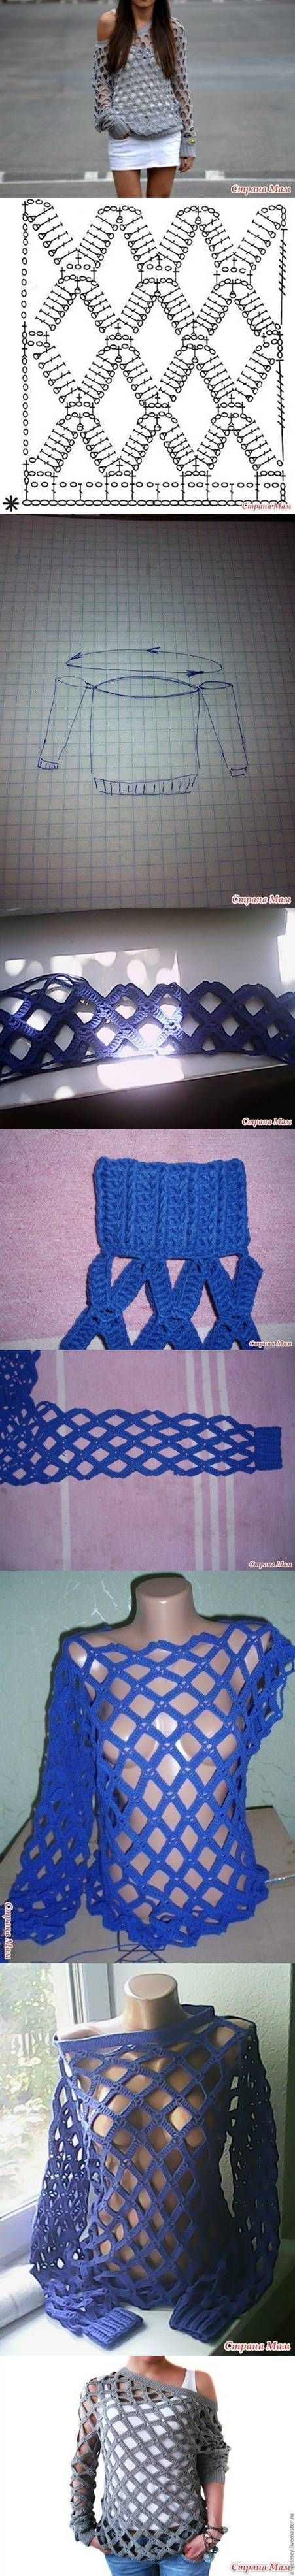 DIY Crochet Blouse DIY Projects / UsefulDIY.com